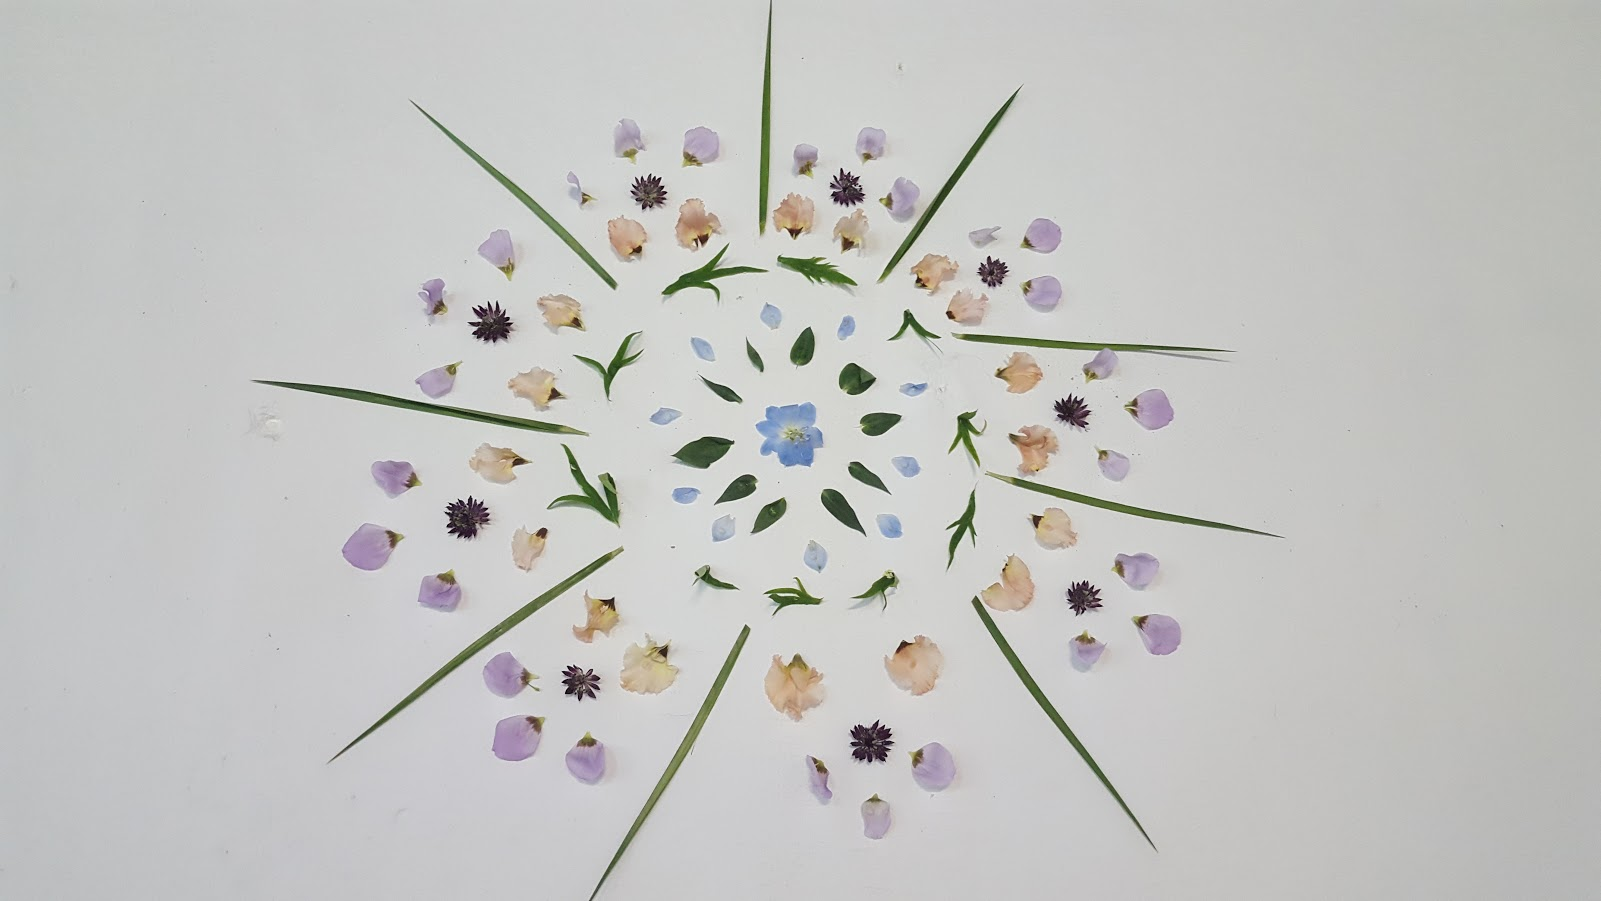 mándala de flores